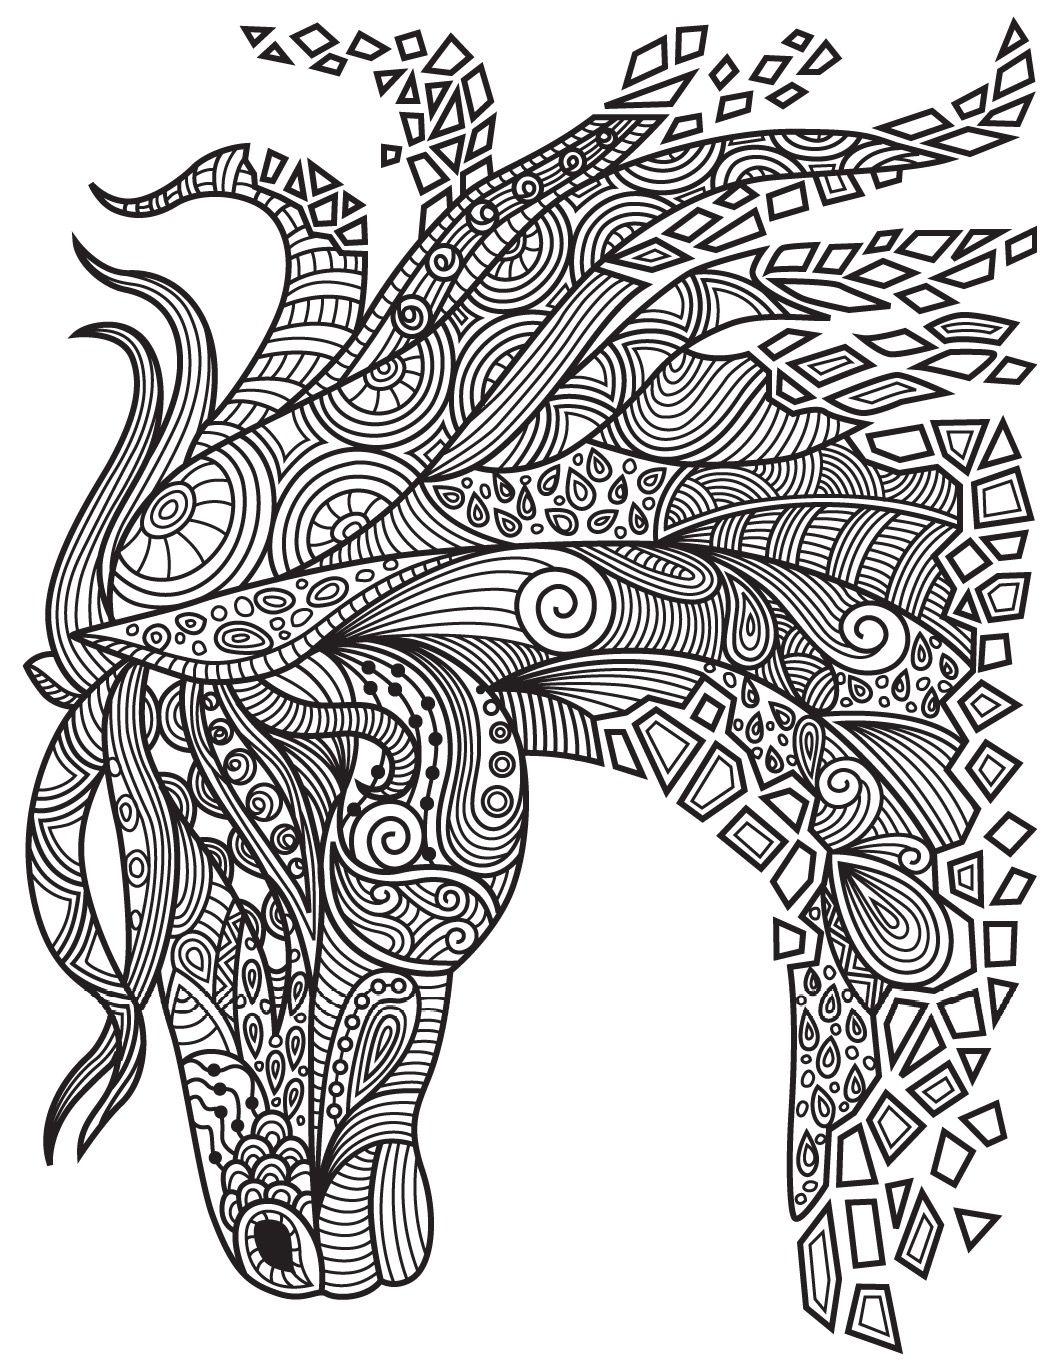 Zen coloring books for adults app - Horses Colorish Coloring Book App For Adults Mandala Relax By Goodsofttech